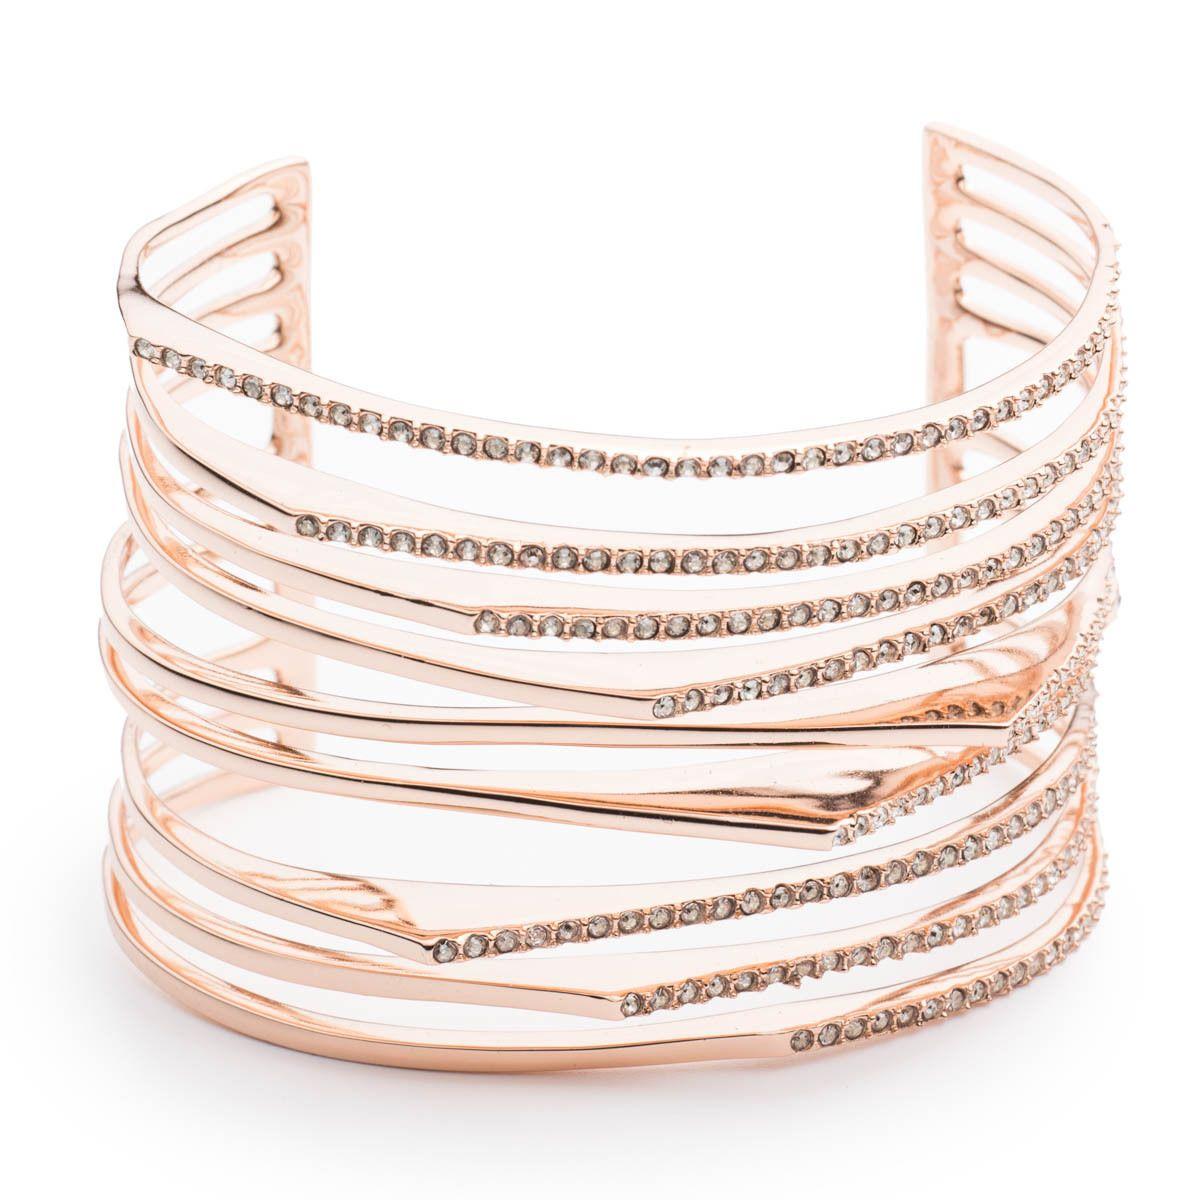 Crystal encrusted origami cuff bracelet jewelryaccesories pinterest